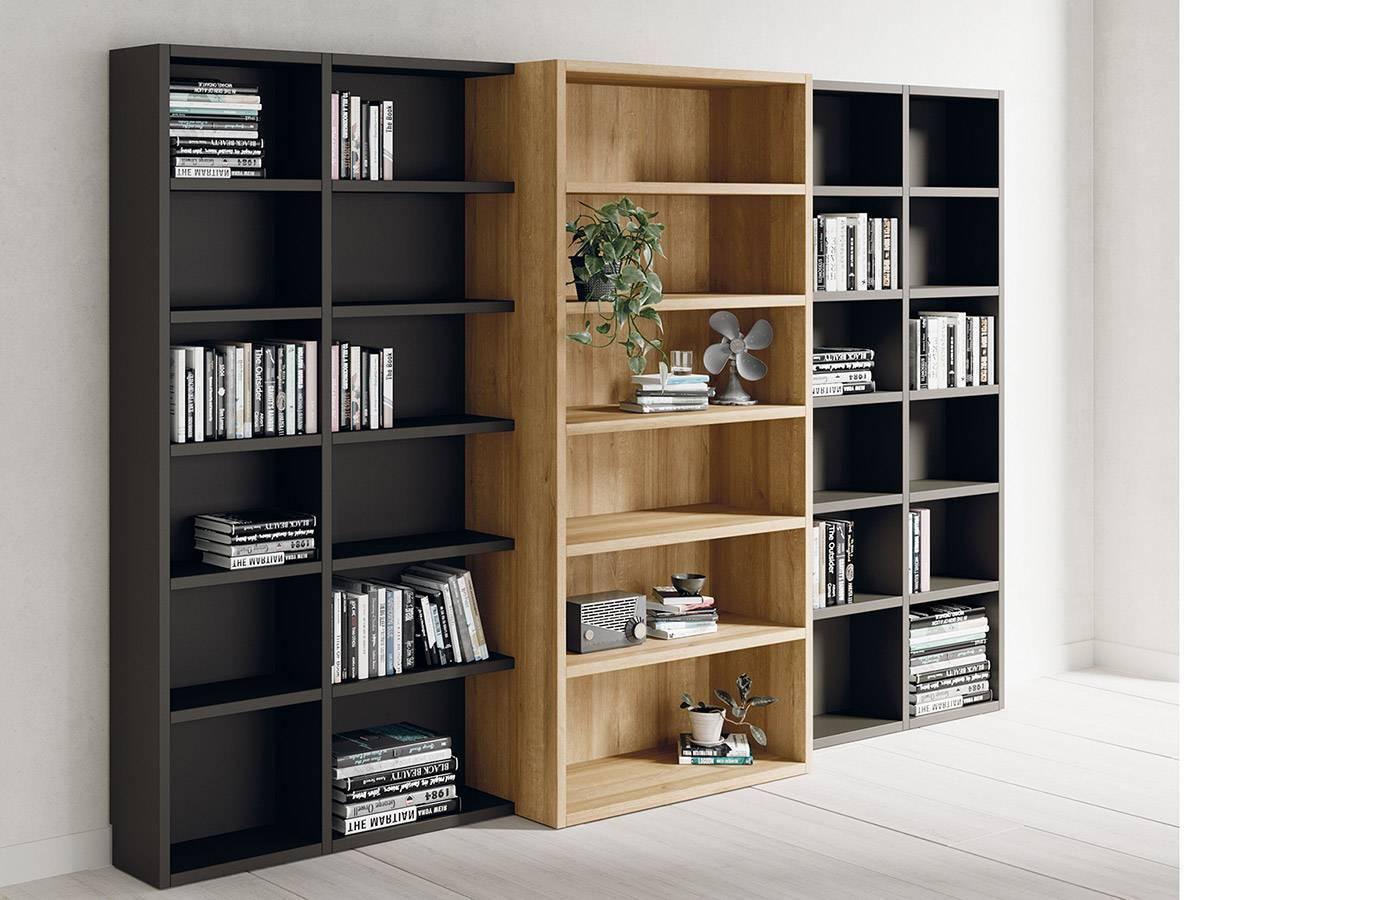 Librería estantería AddBox 35 de Lagrama